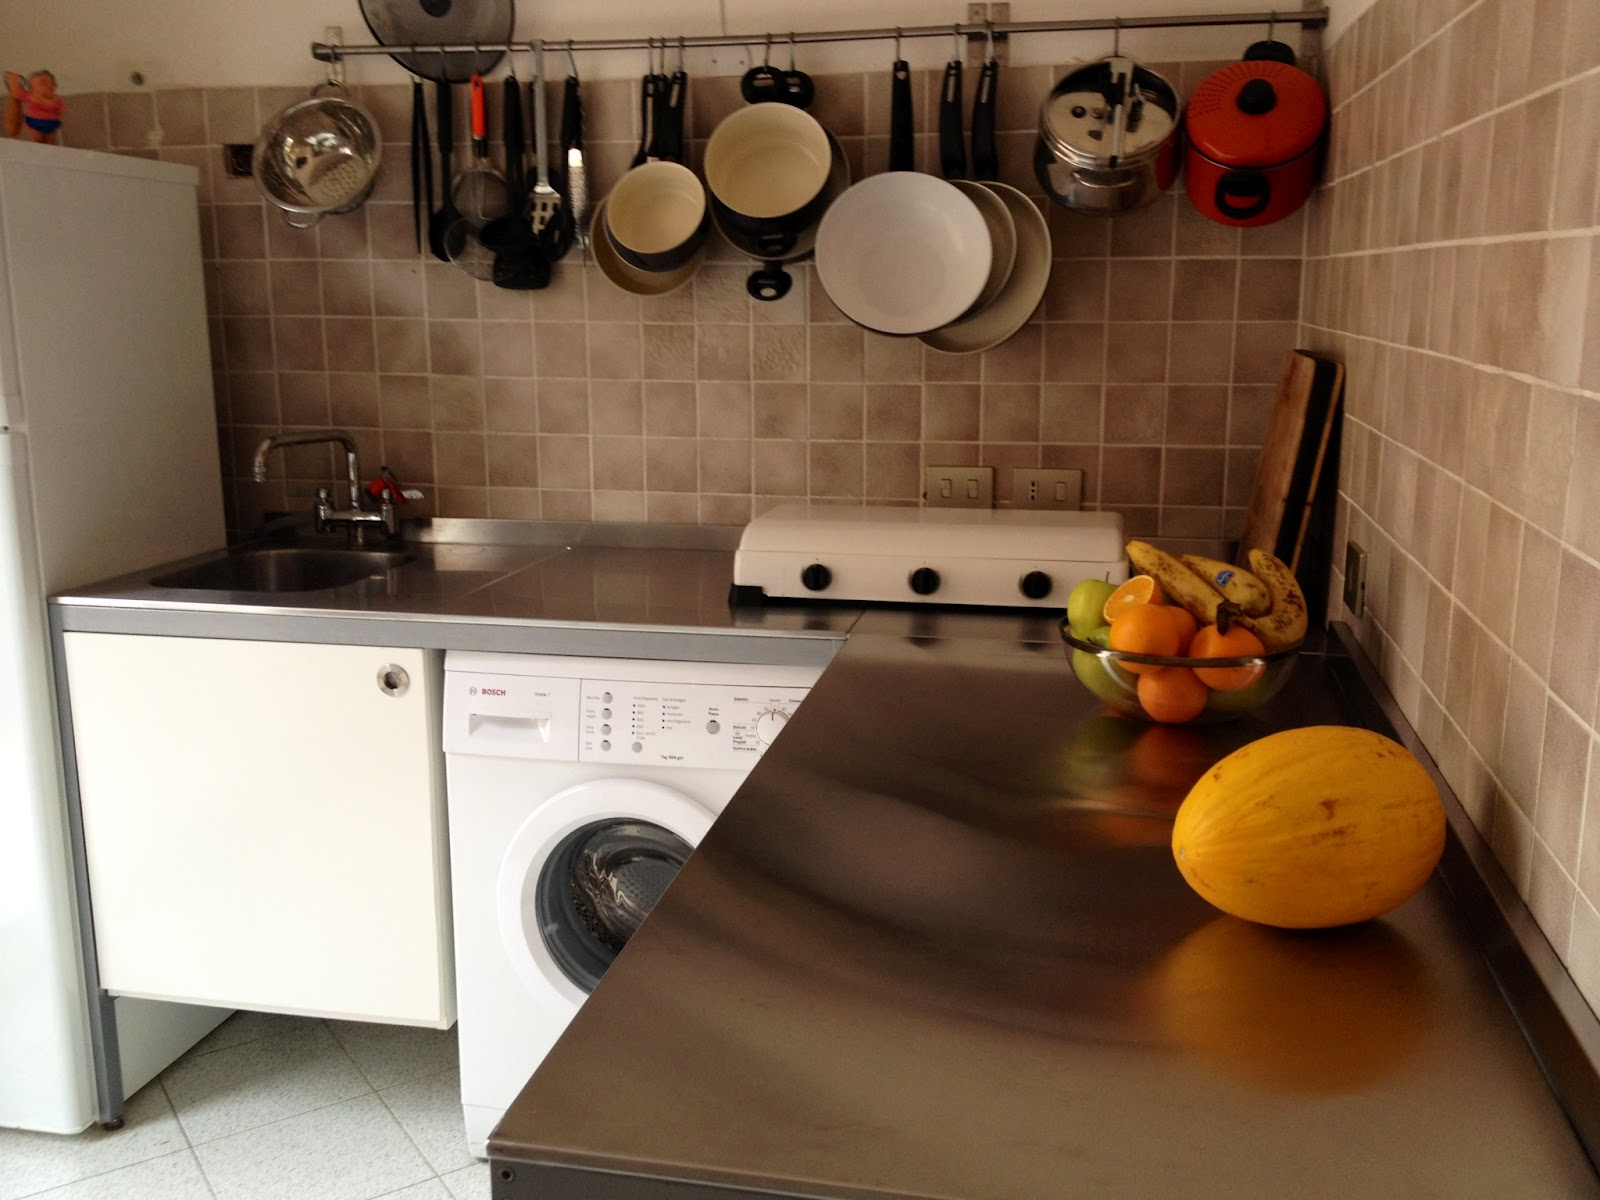 Blanca e fulvio traslocano cucina completa - Cucina completa ikea ...